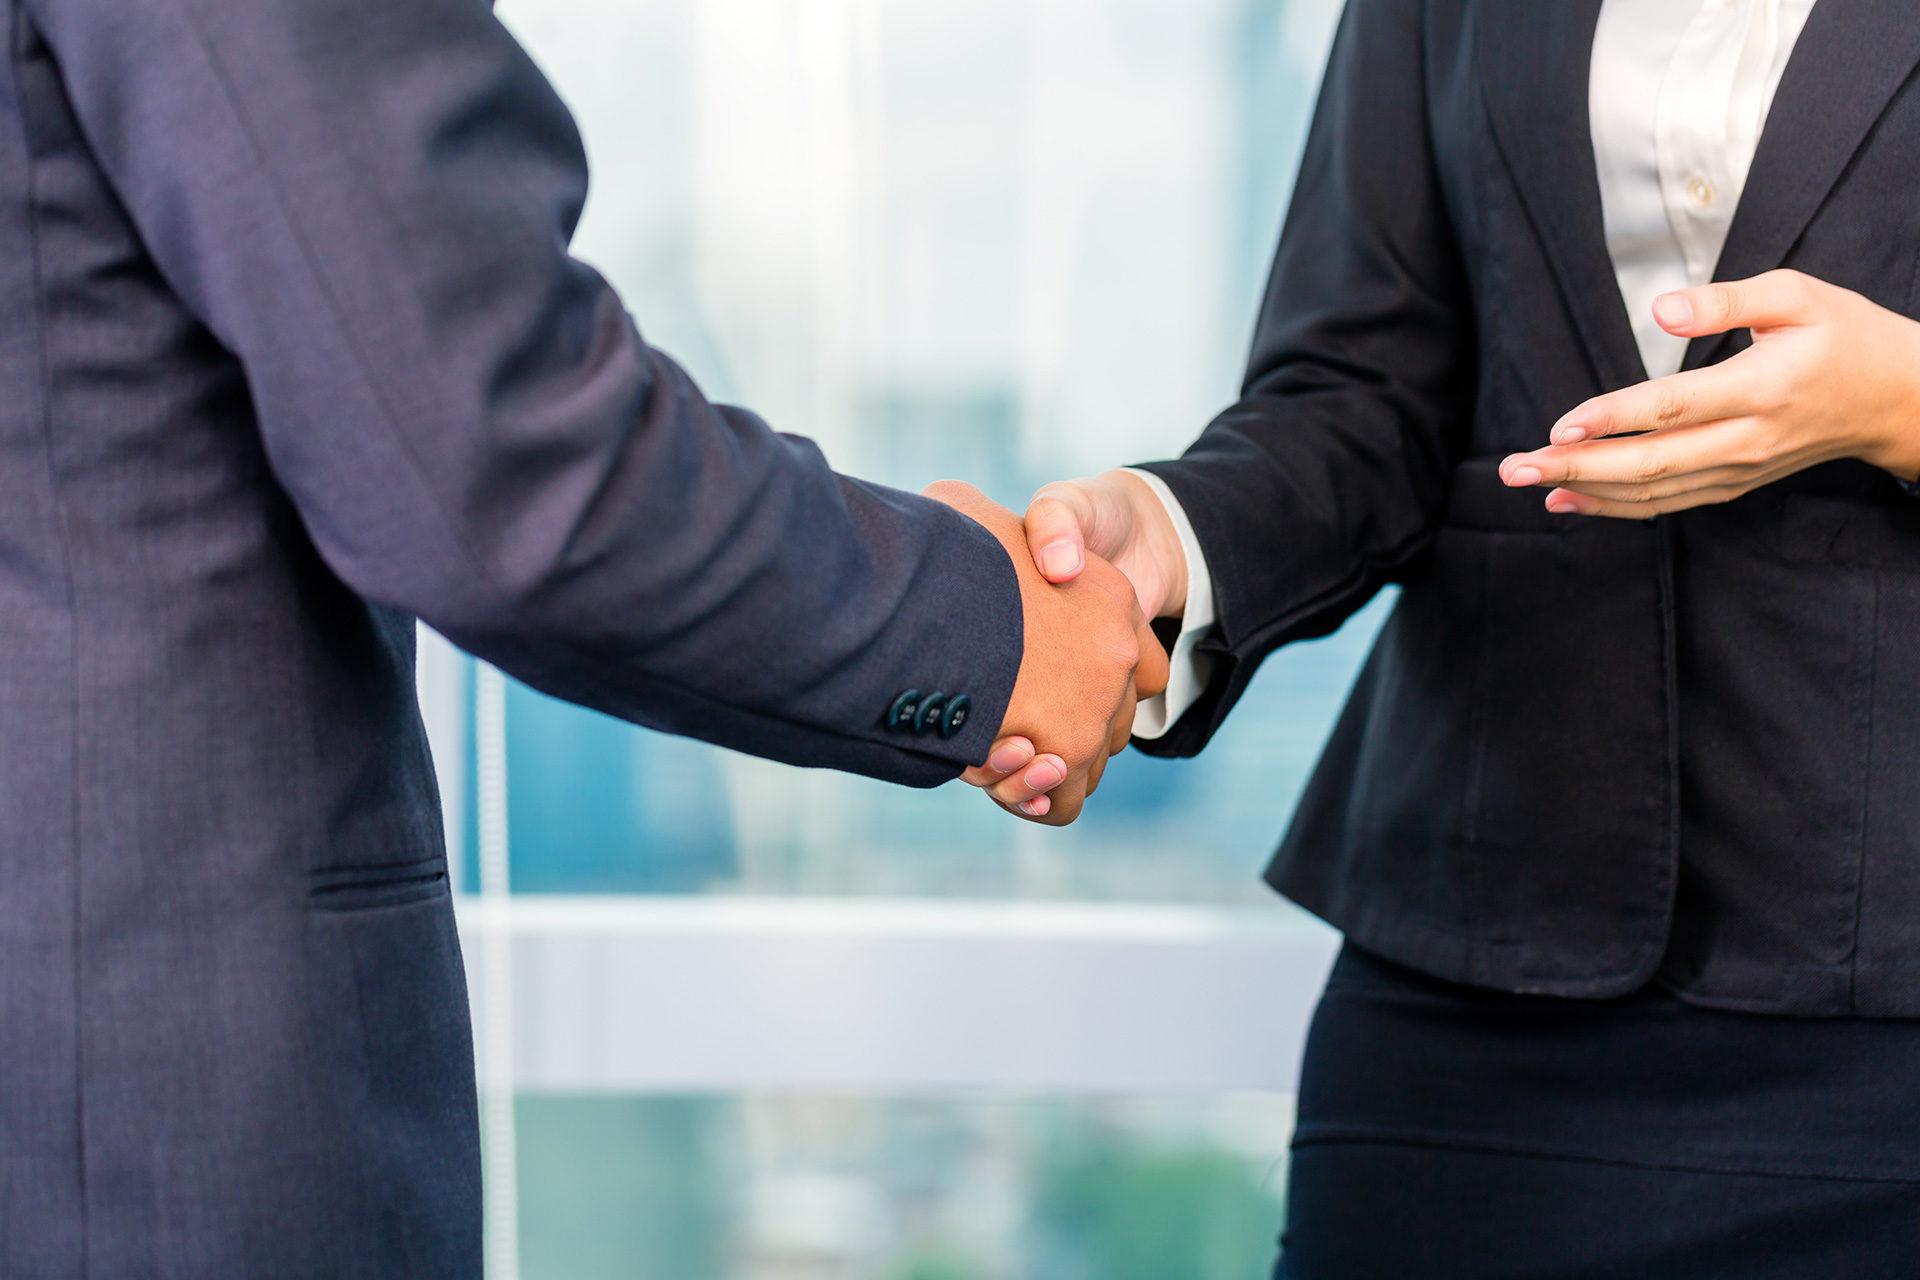 Schending geheimhoudingsbeding leidt tot ontbinding van de vaststellingsovereenkomst